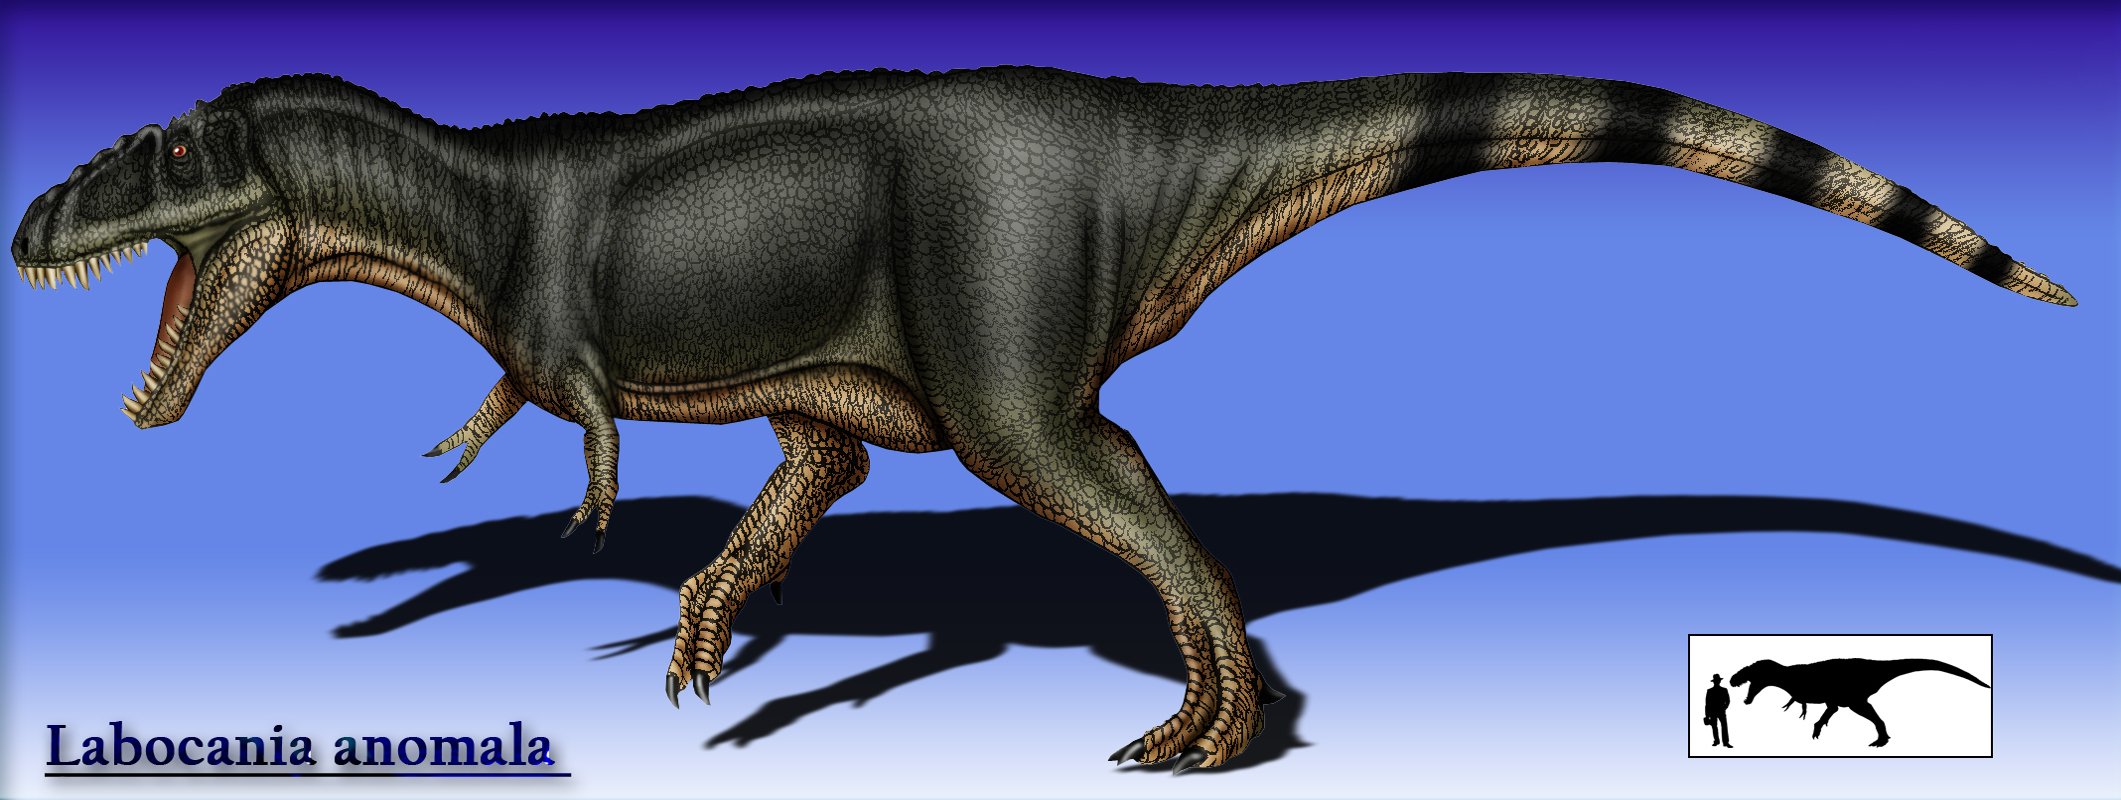 Diary of Nobody: Coelurosauria | 2136 x 800 jpeg 835kB